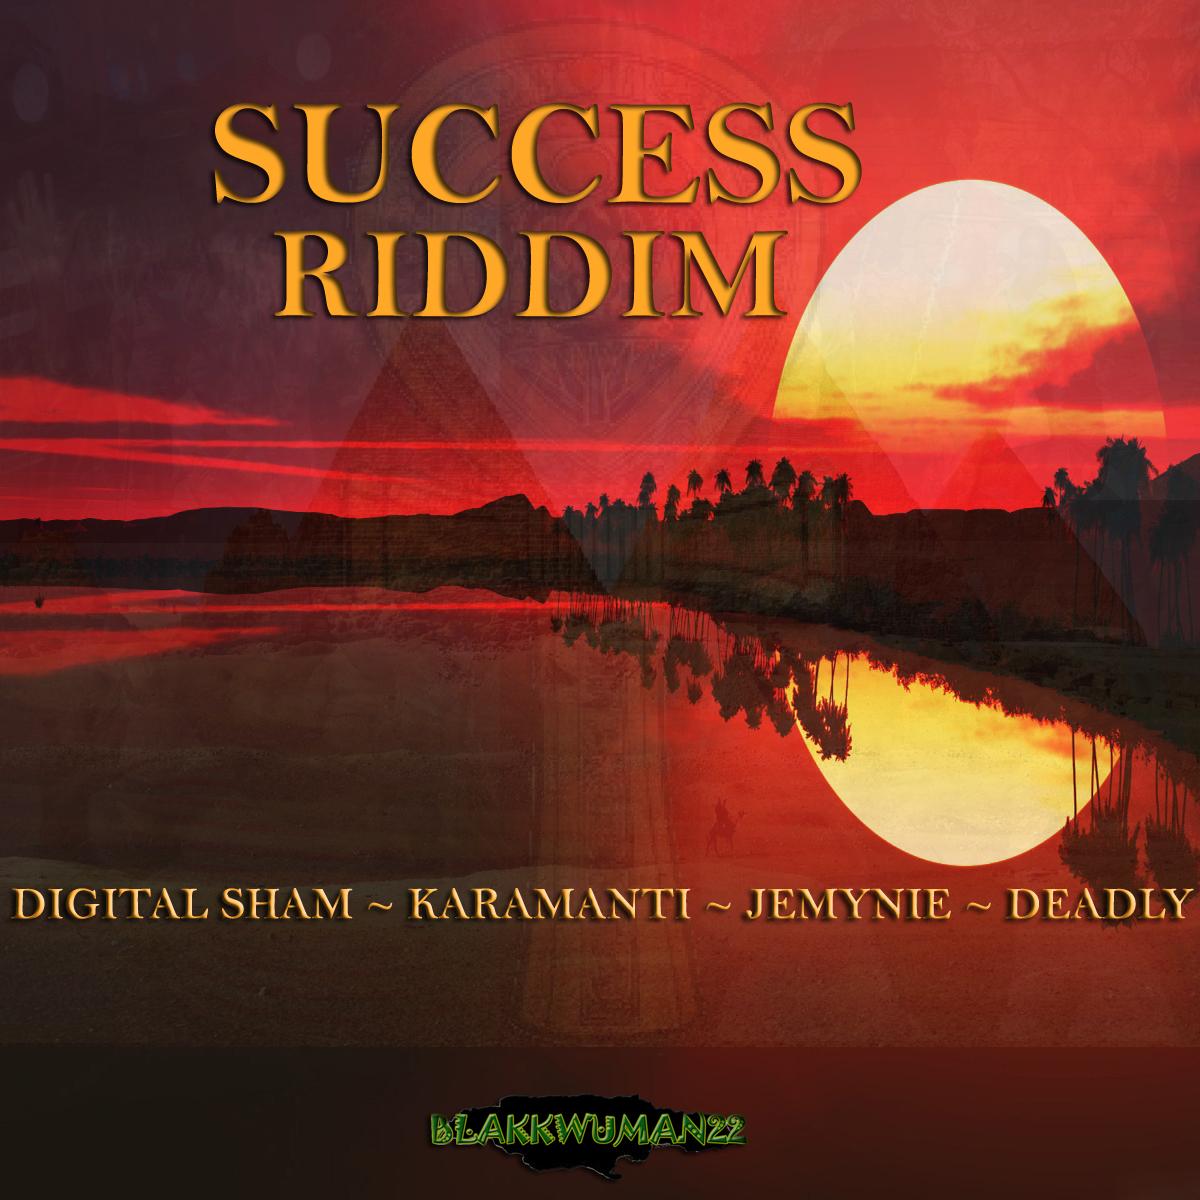 SUCCESS RIDDIM - BW22